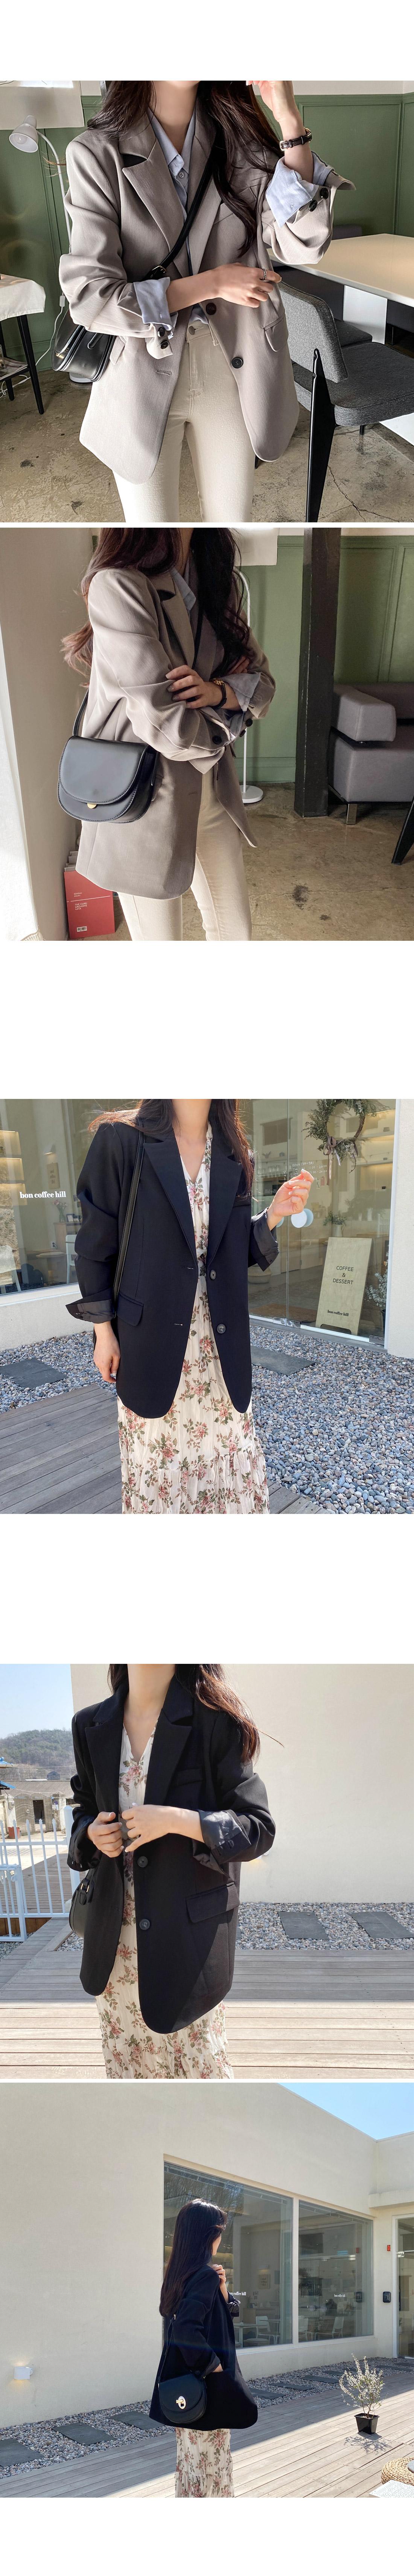 Journal single jacket